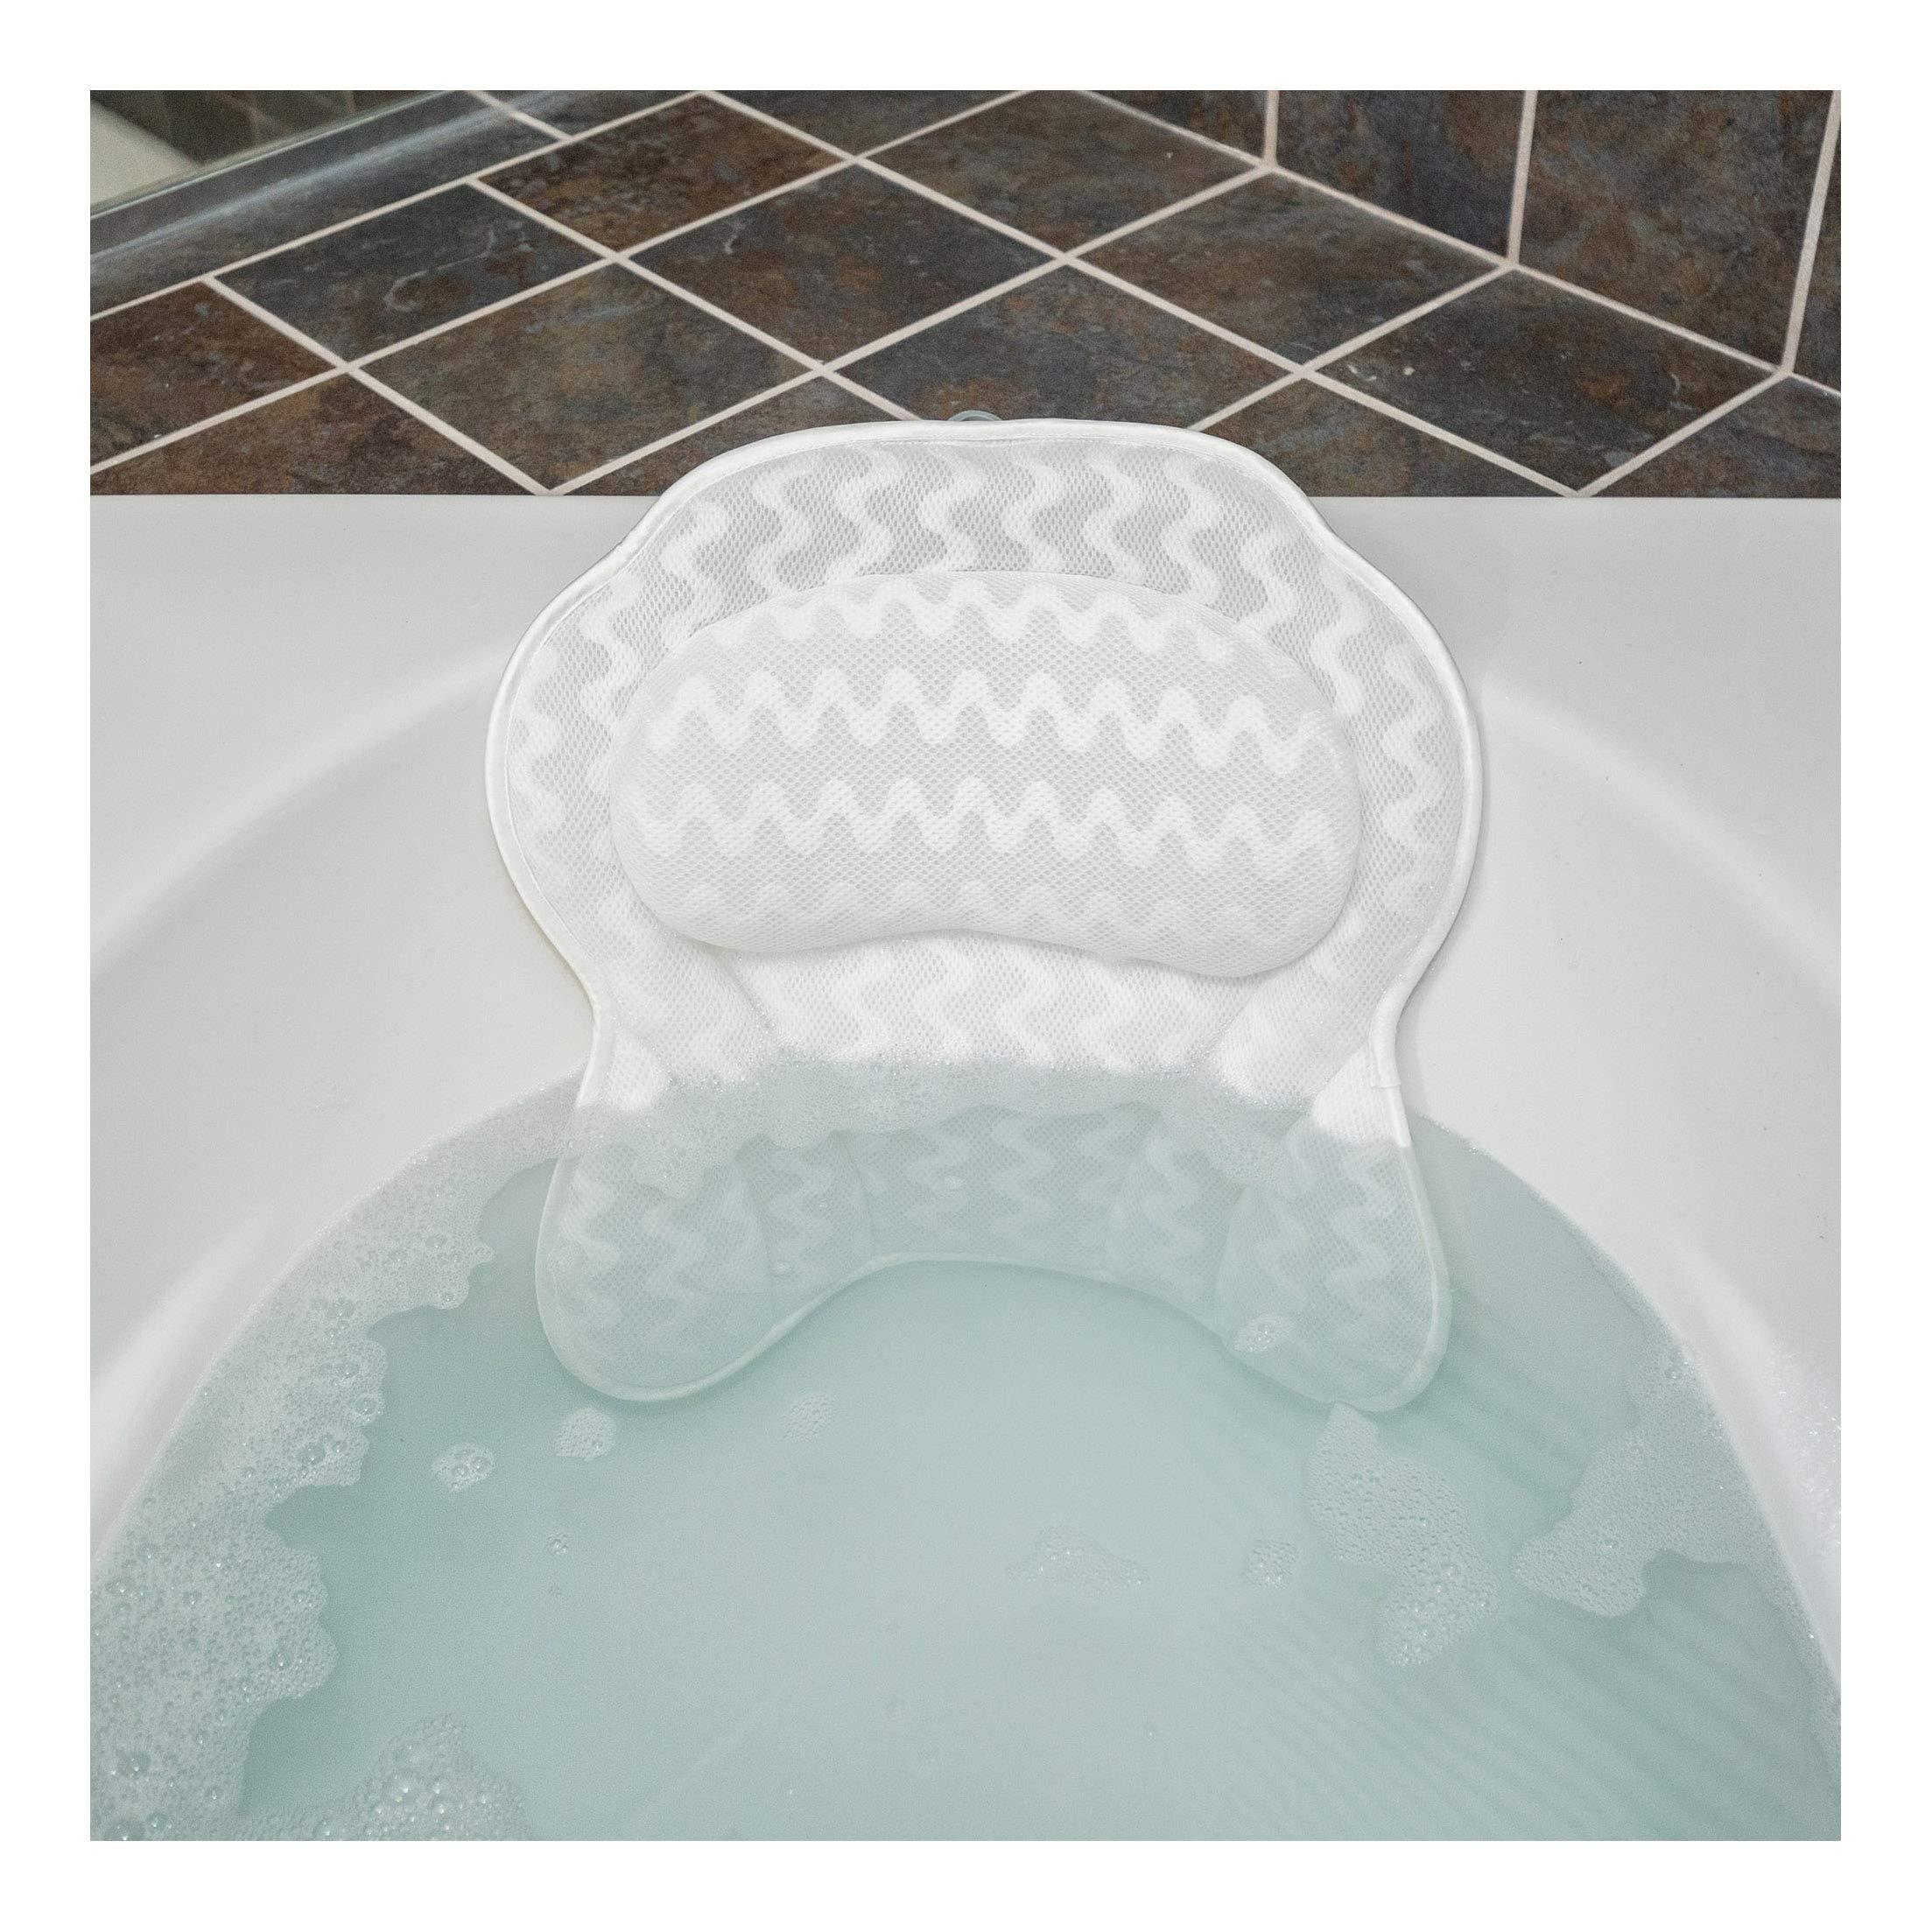 Best jets for bathtub | Amazon.com